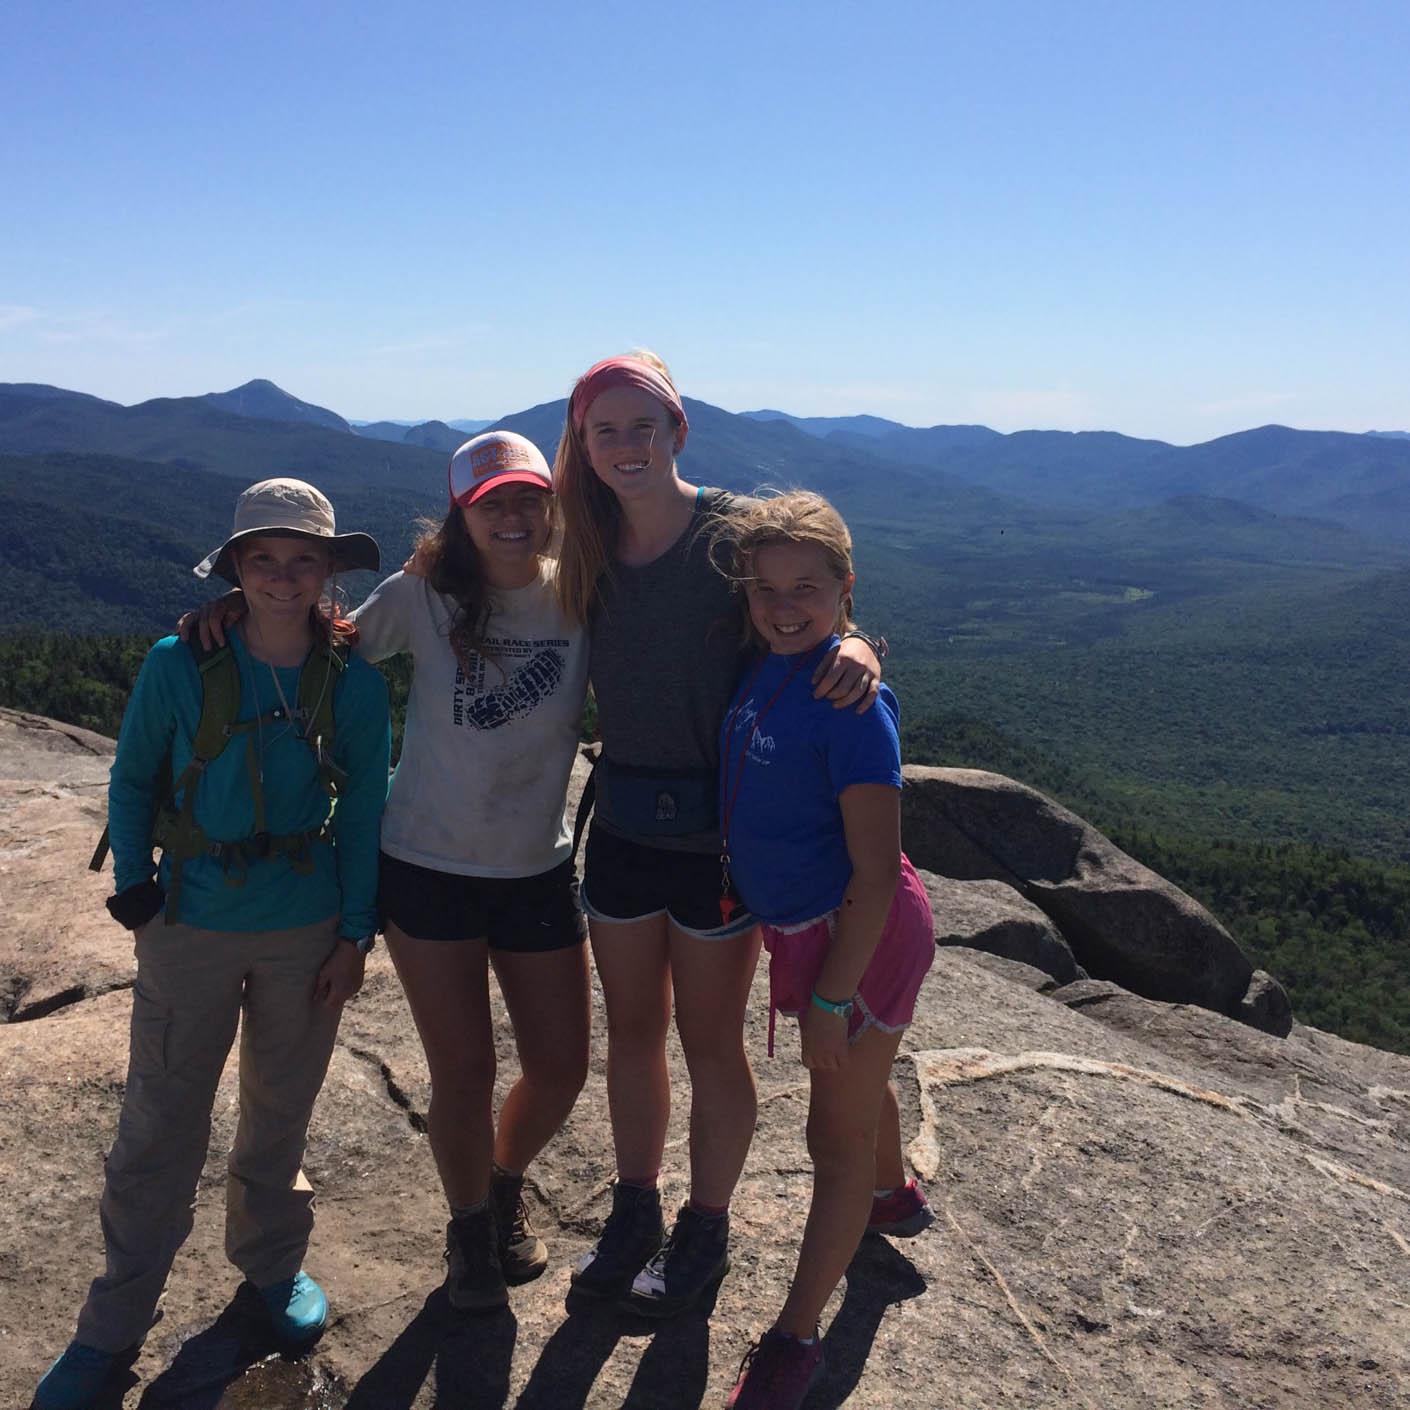 Adirondack Discovery hiking